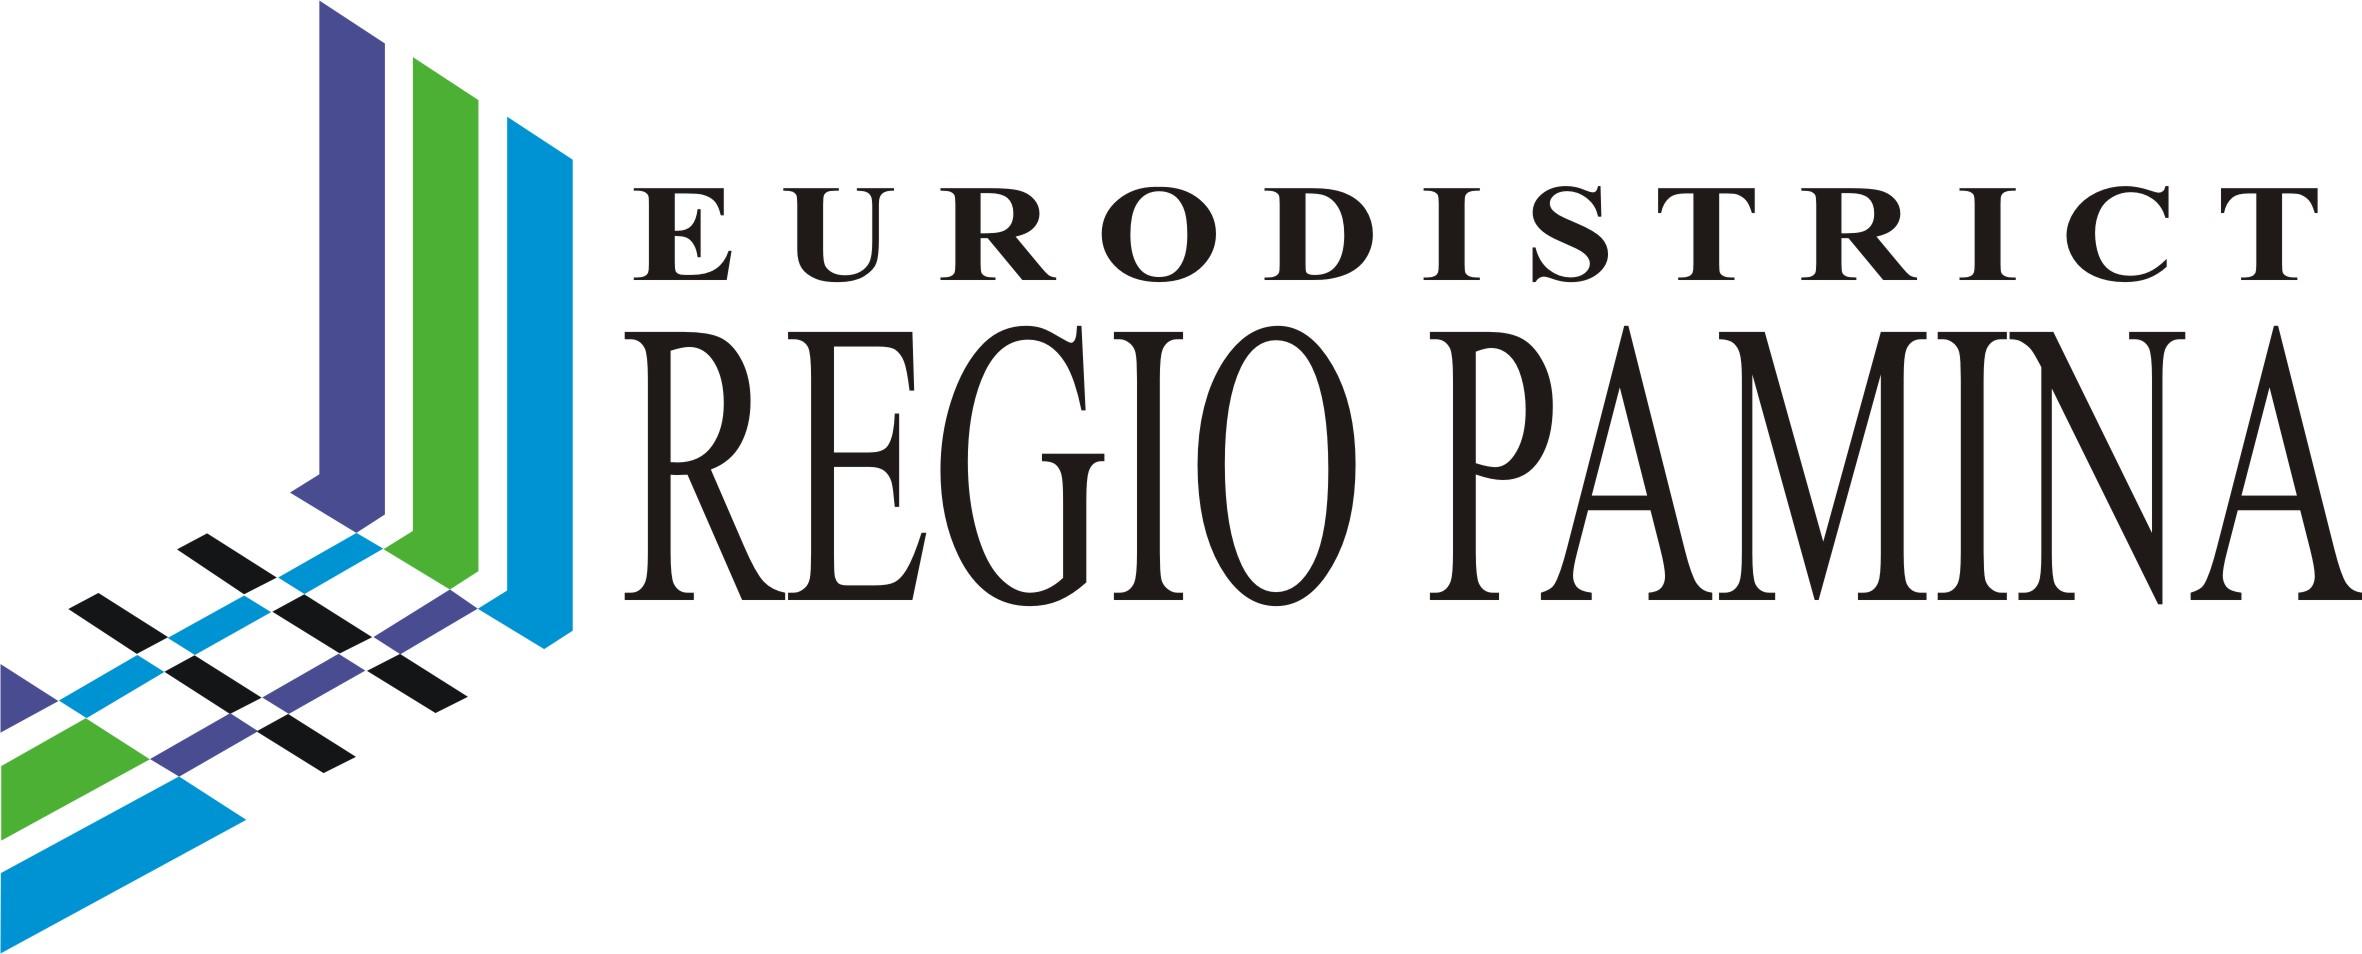 Eurodistrict Regio Pamina